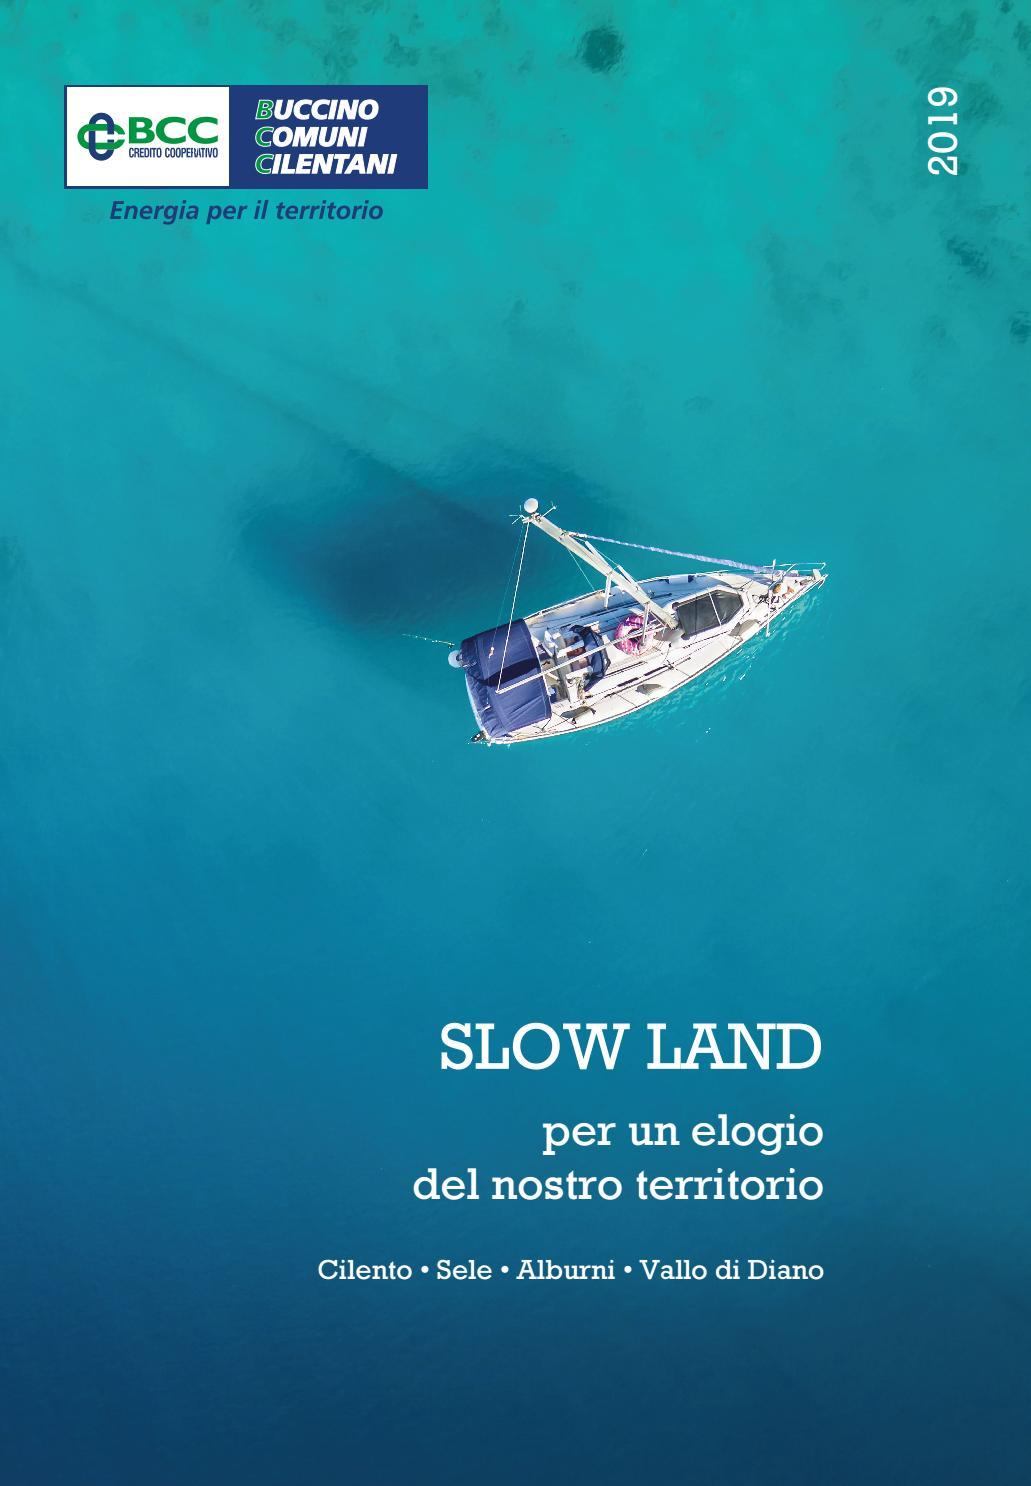 Calendario Buccino.Slow Land Per Un Elogio Del Nostro Territorio Calendario